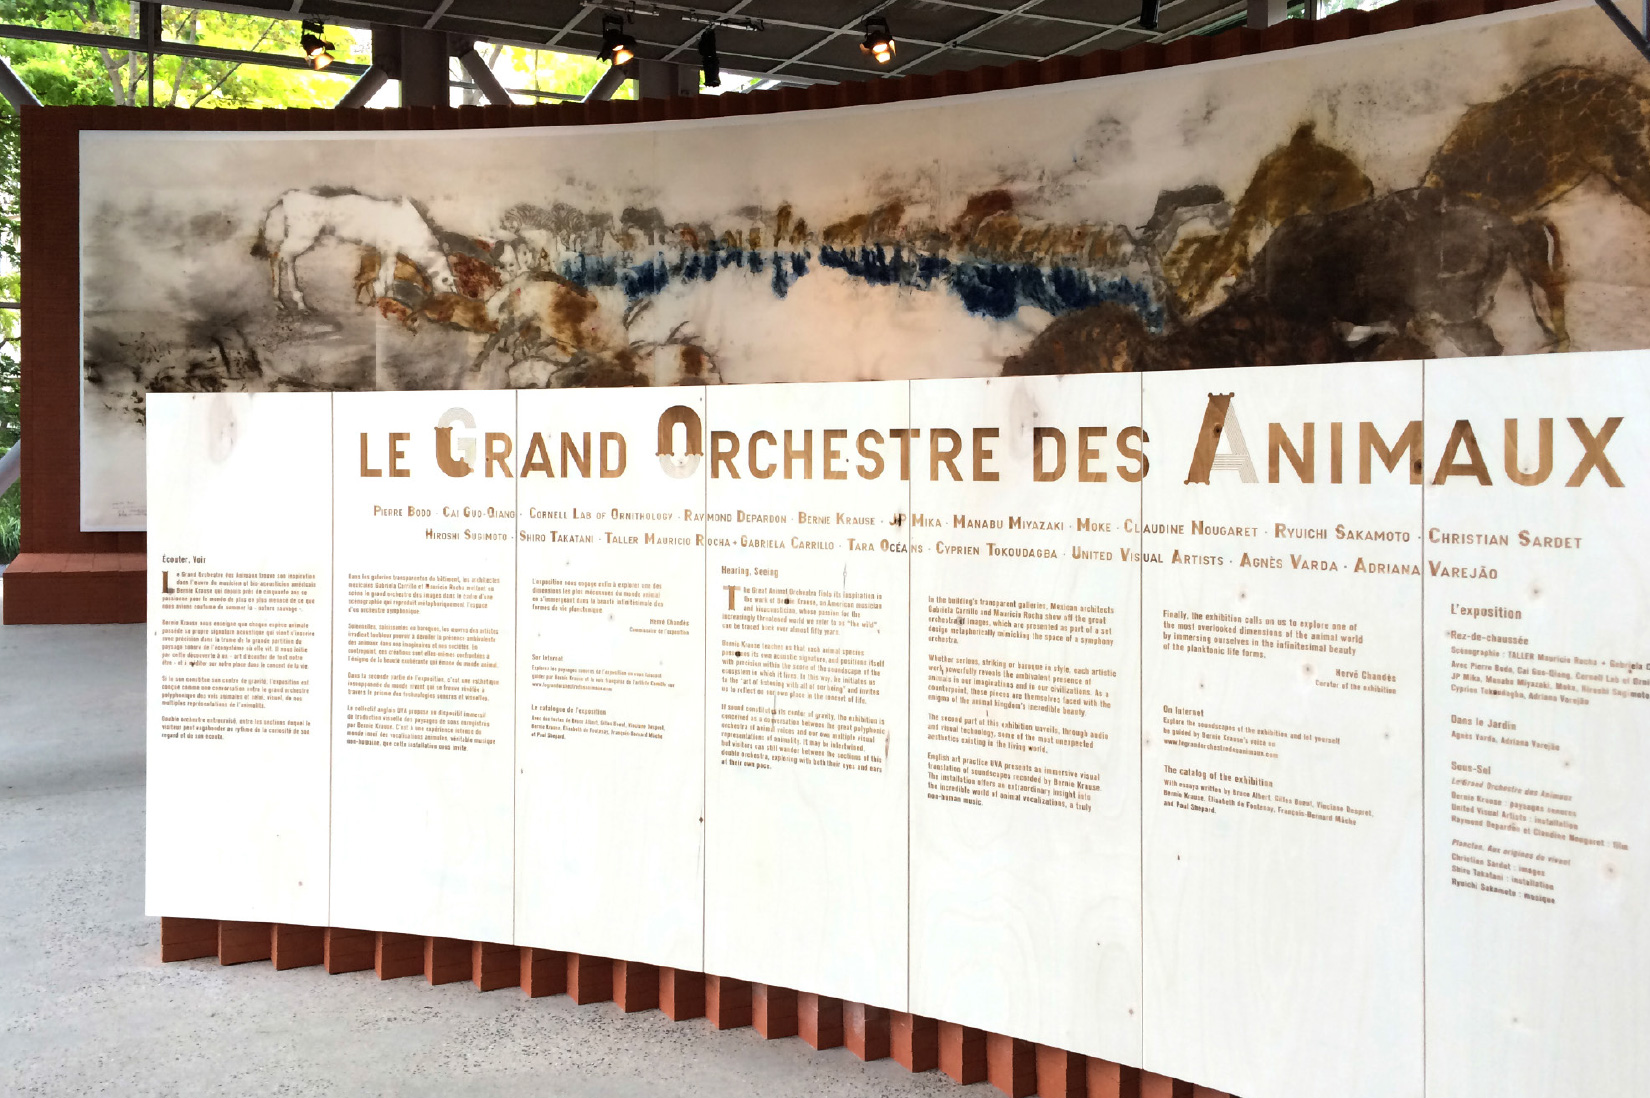 grand-orchestre-des-animaux-04.jpg